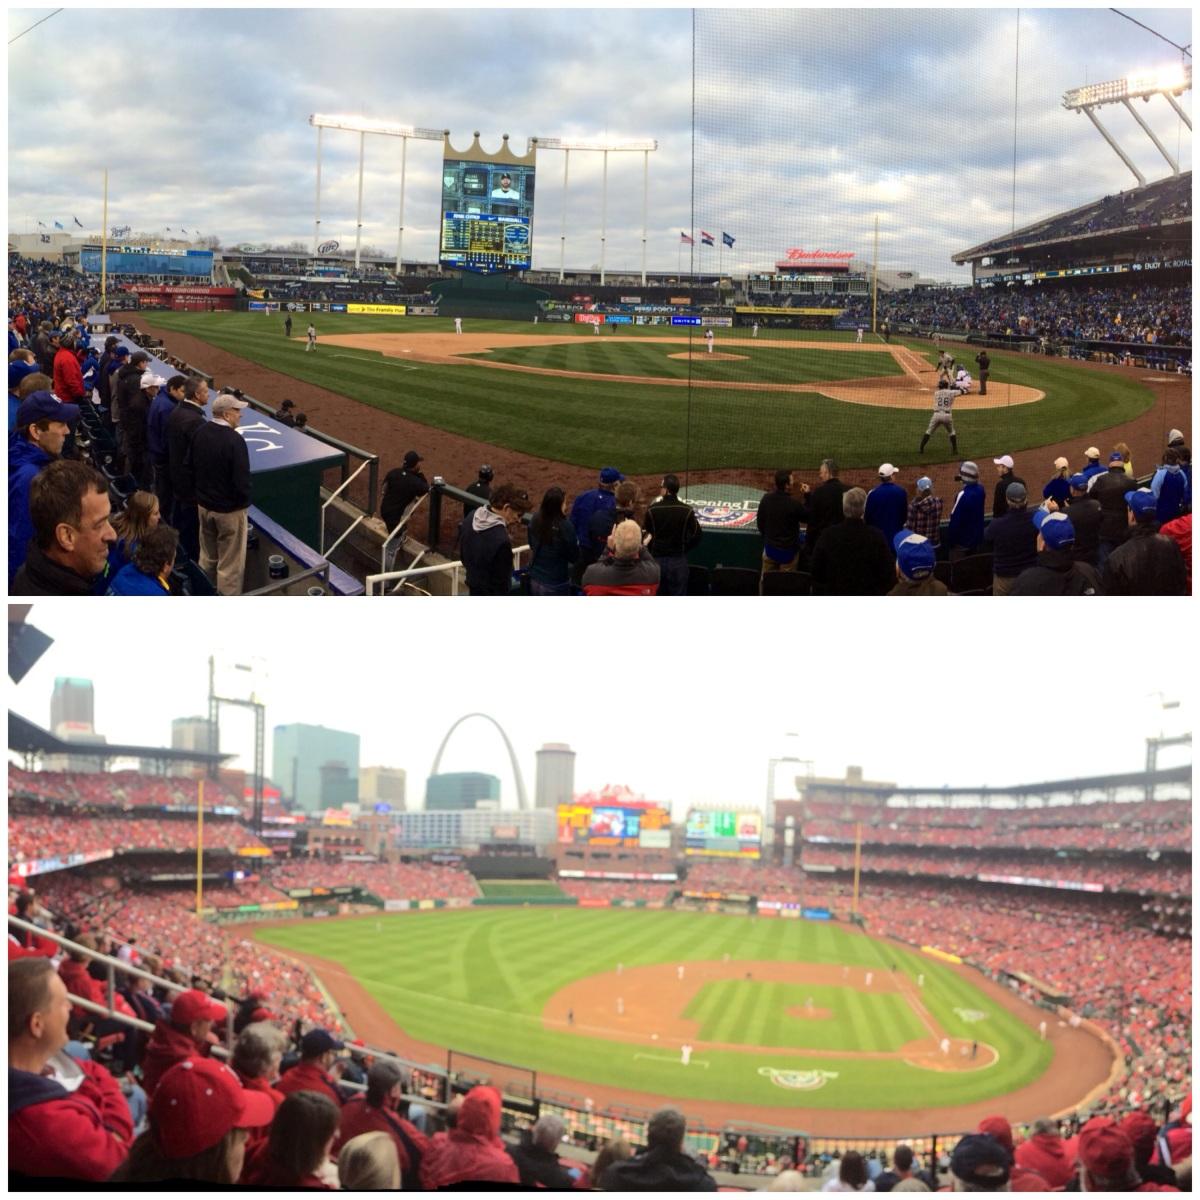 Games 2 & 3: Kauffman Stadium, Kansas City & Busch Stadium, St.Louis